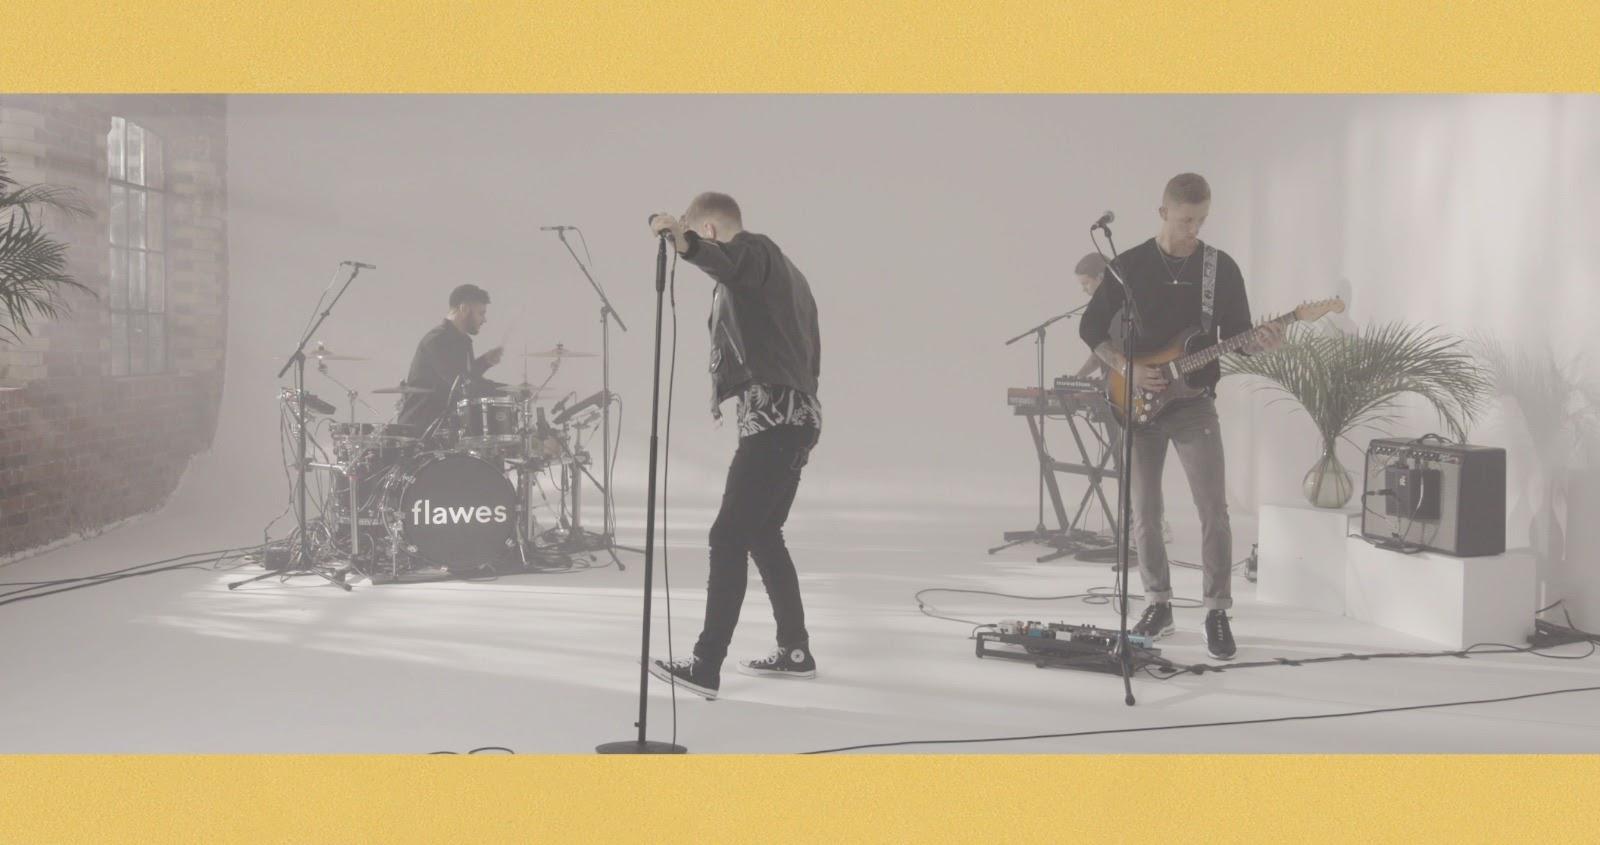 music video - look no further - flawes - uk - indie music - indie pop - new music - music blog - indie blog - wolf in a suit - wolfinasuit - wolf in a suit blog - wolf in a suit music blog